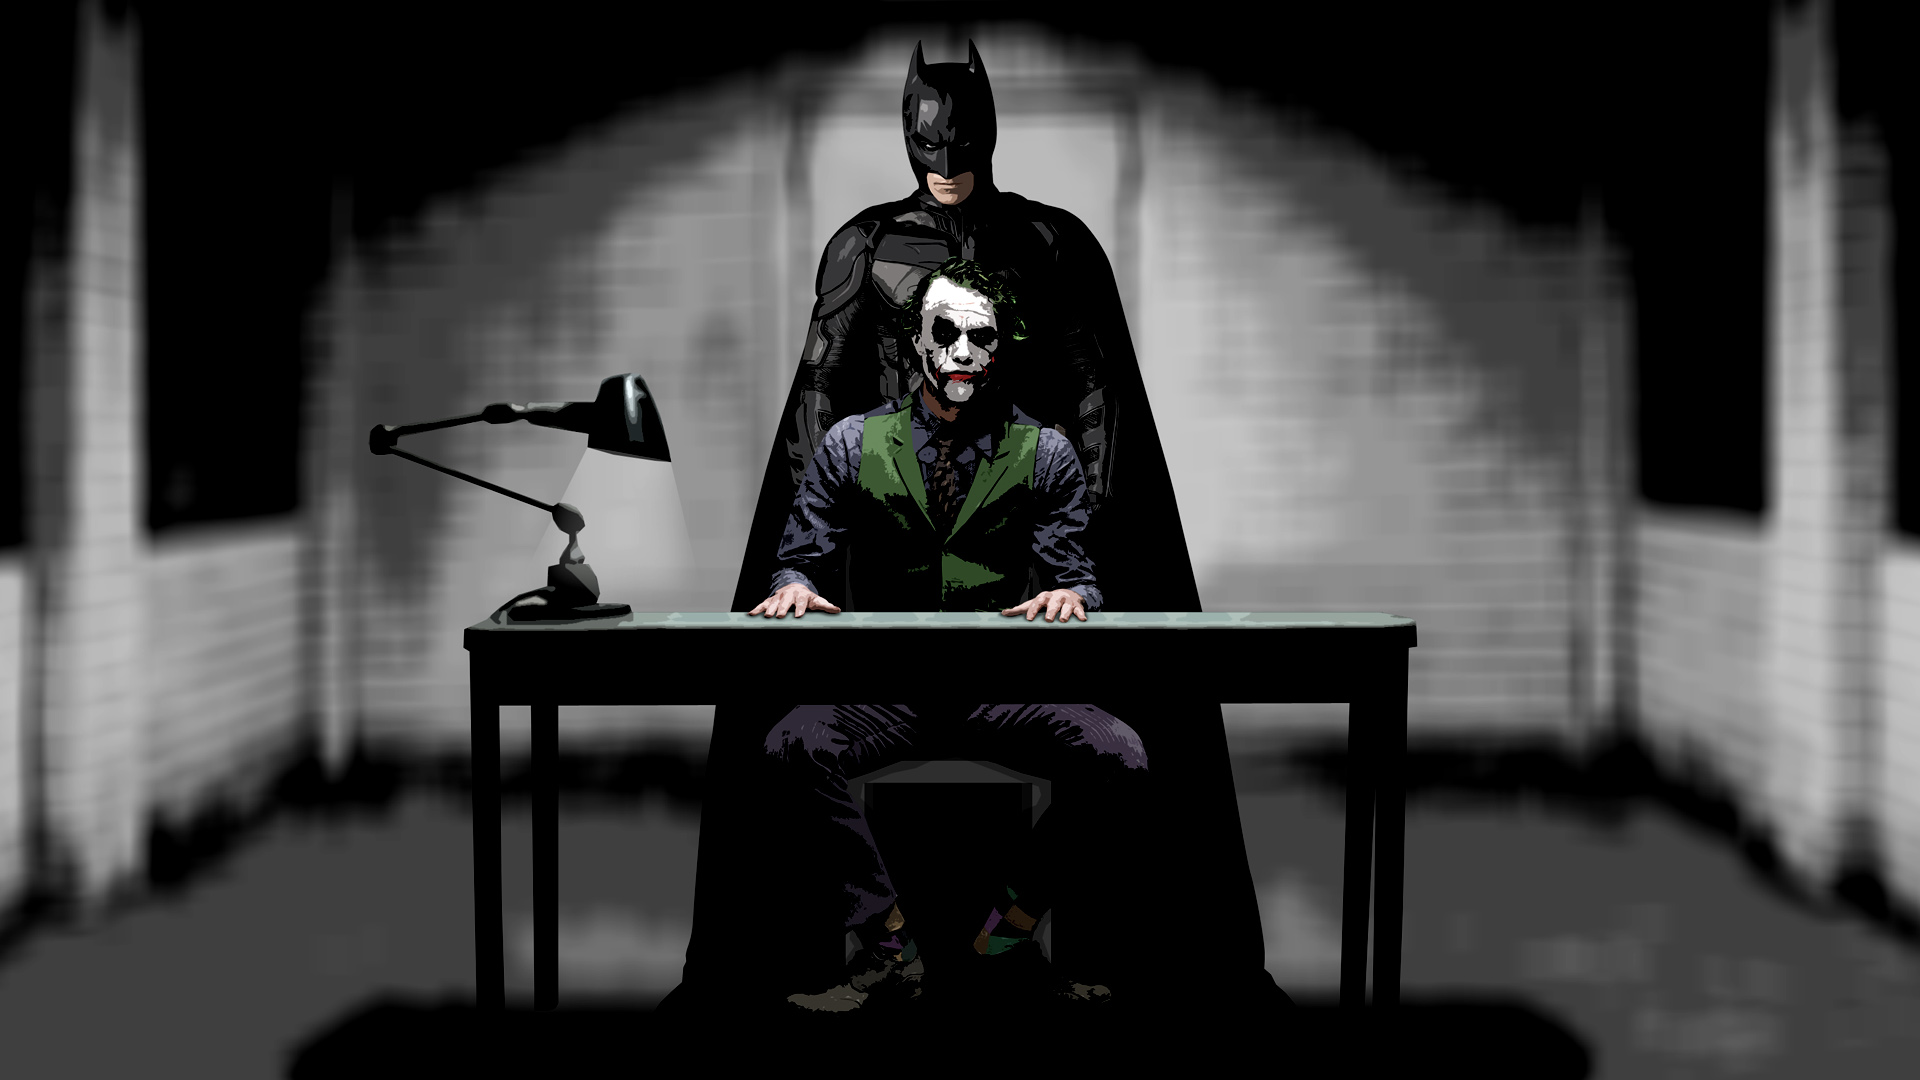 Wallpaper download joker - Batman The Joker Full Hd Desktop Wallpapers 1080p